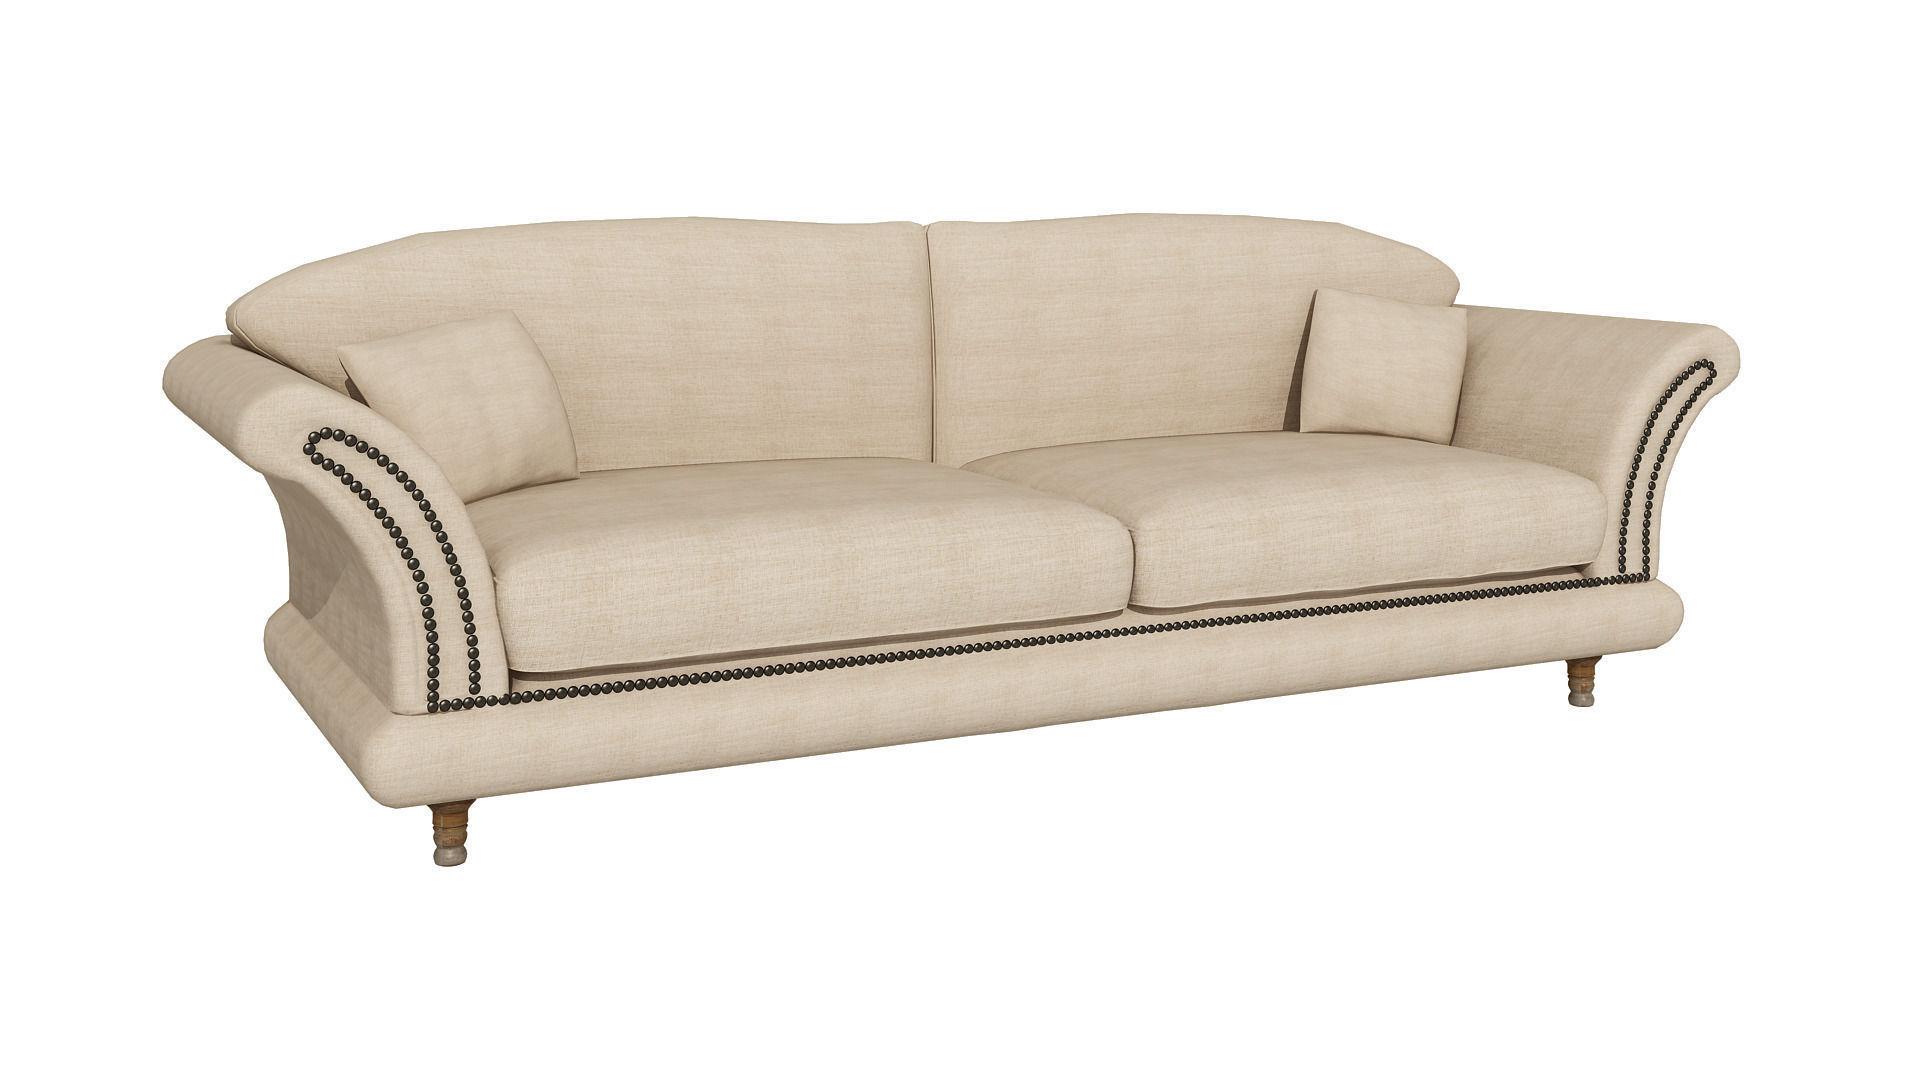 Modern sofa 237 3d model max for Sofa 3d model